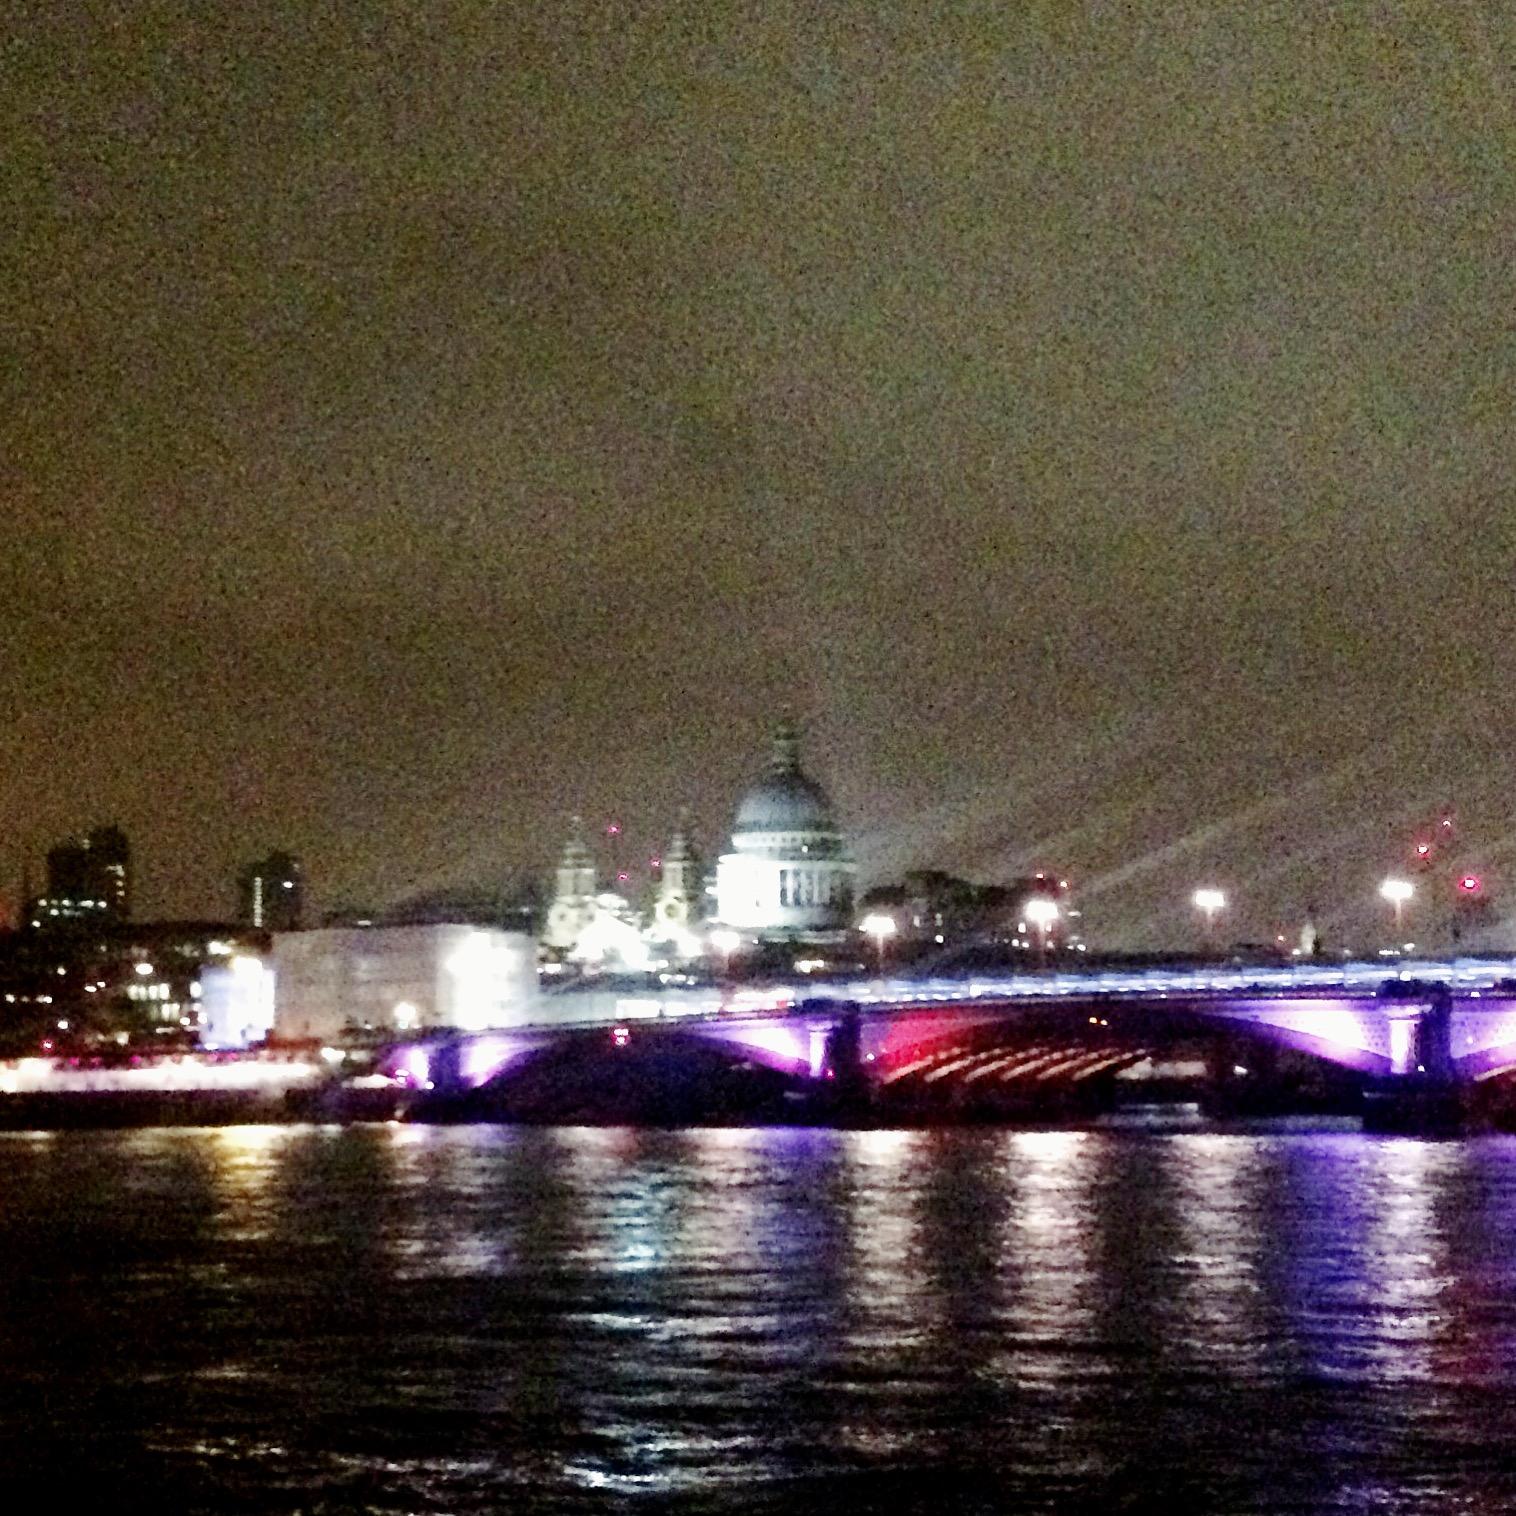 London, that minx